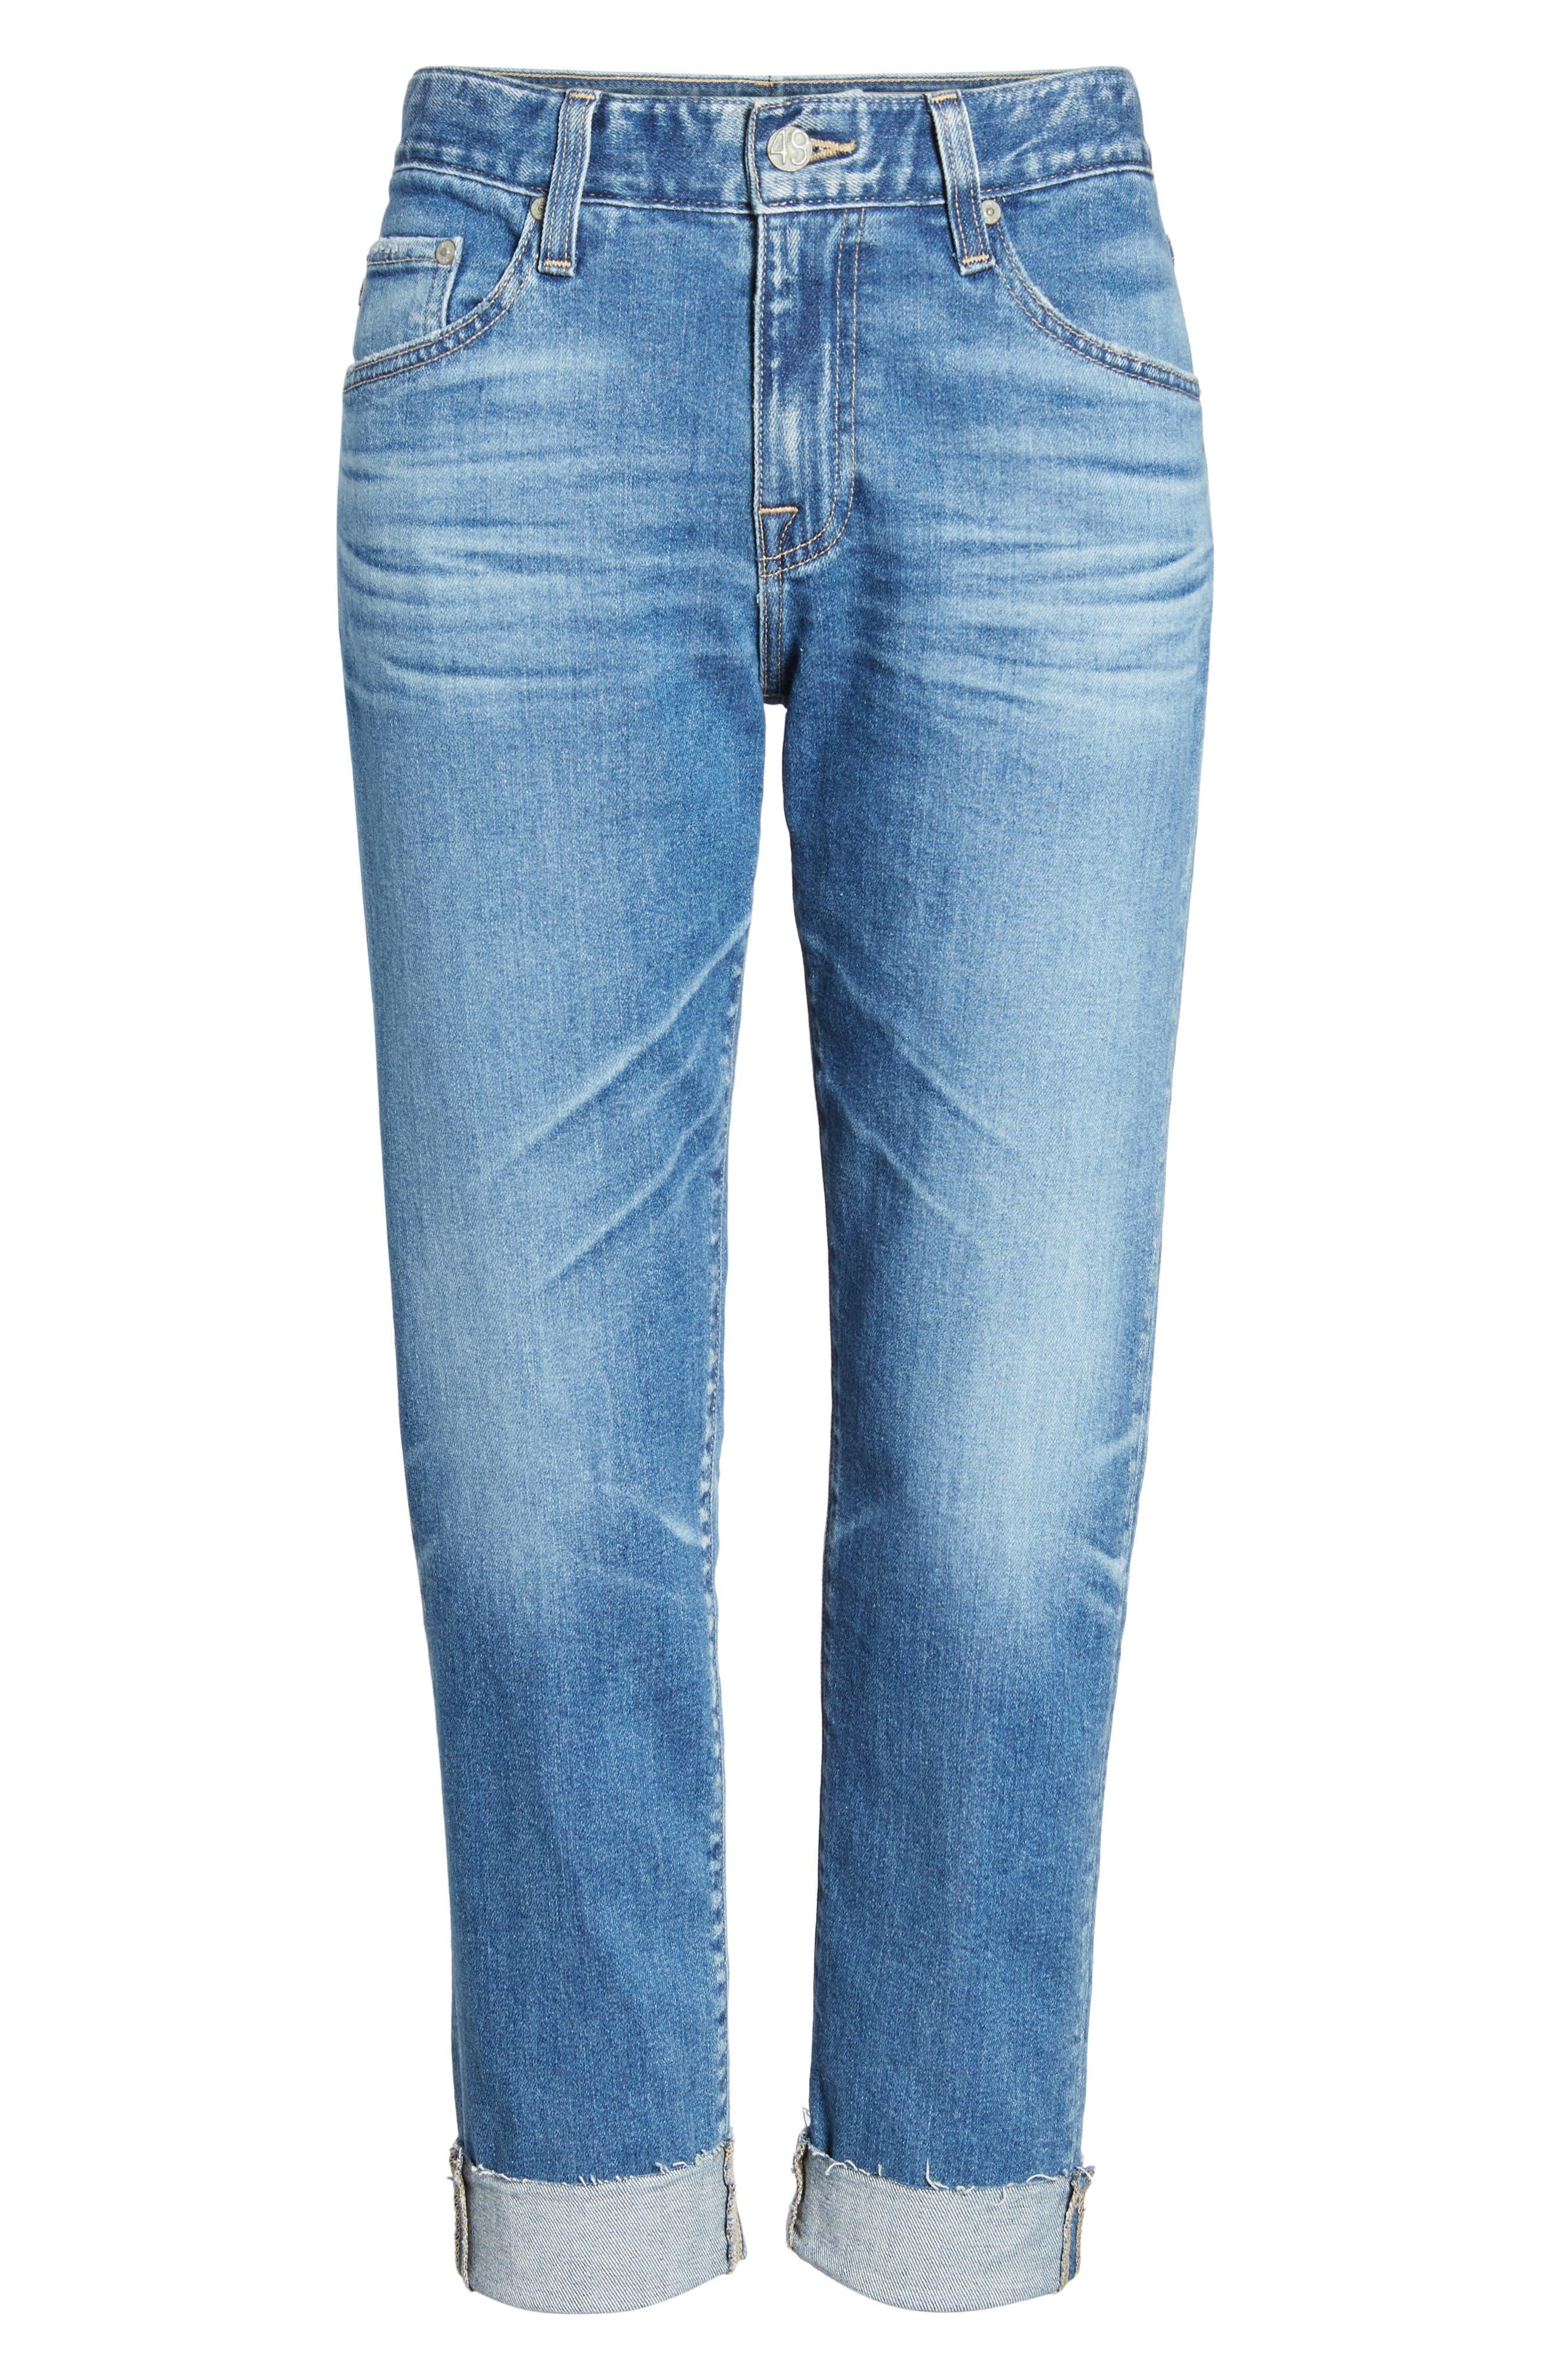 The Ex-Boyfriend Slim Jeans,                             Alternate thumbnail 7, color,                             14 Years Foxtail